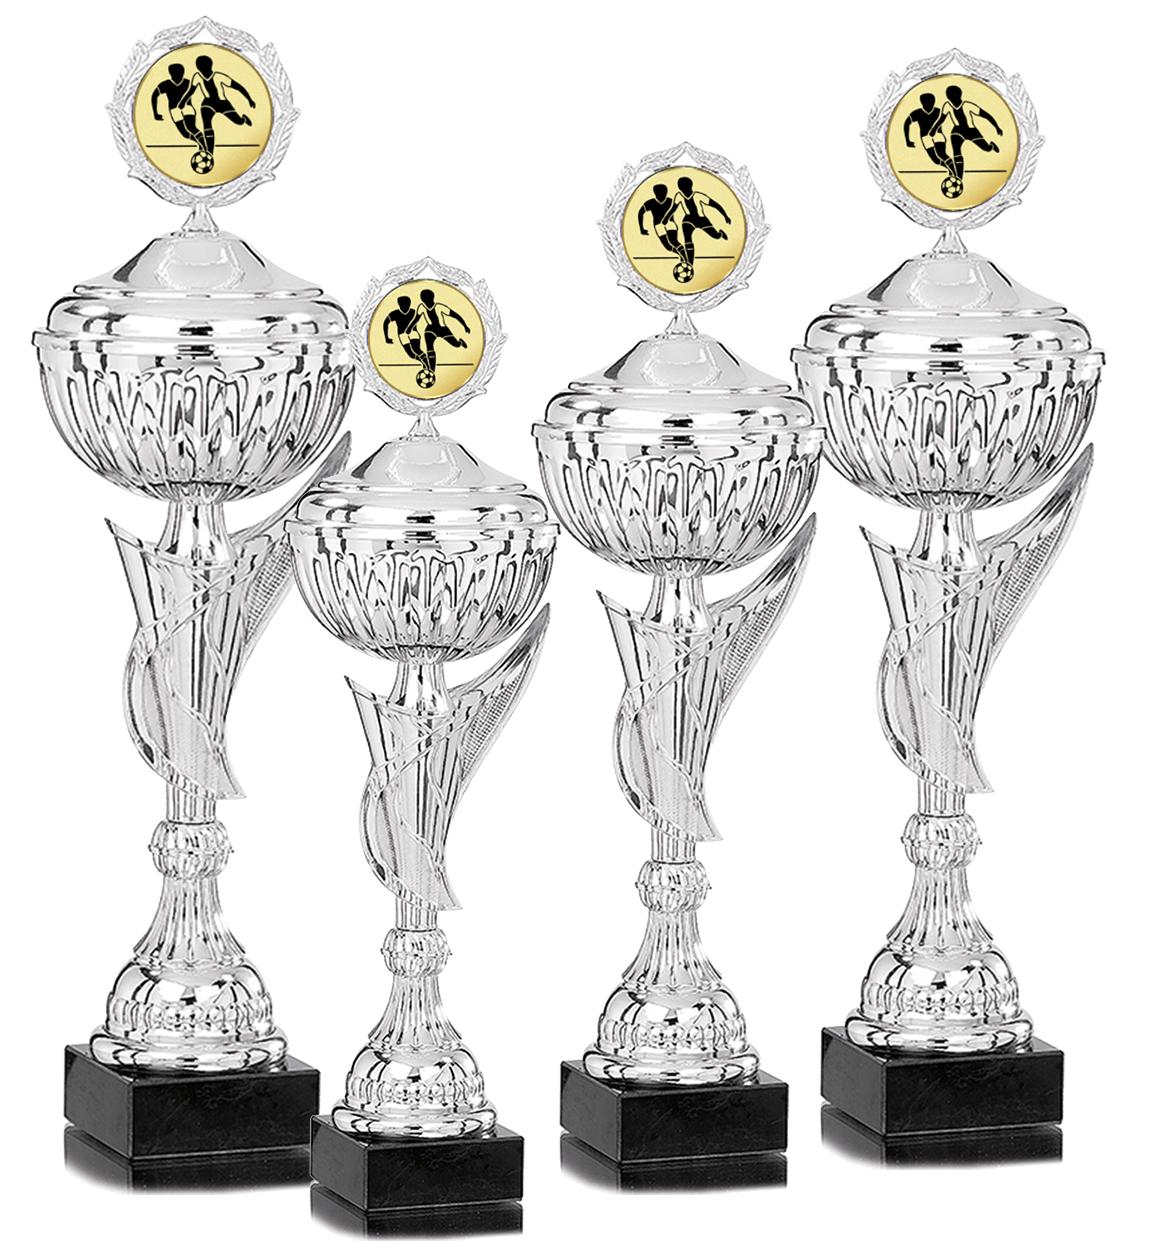 4er Pokalserie 36-49 cm Pokale Silberpokal silber